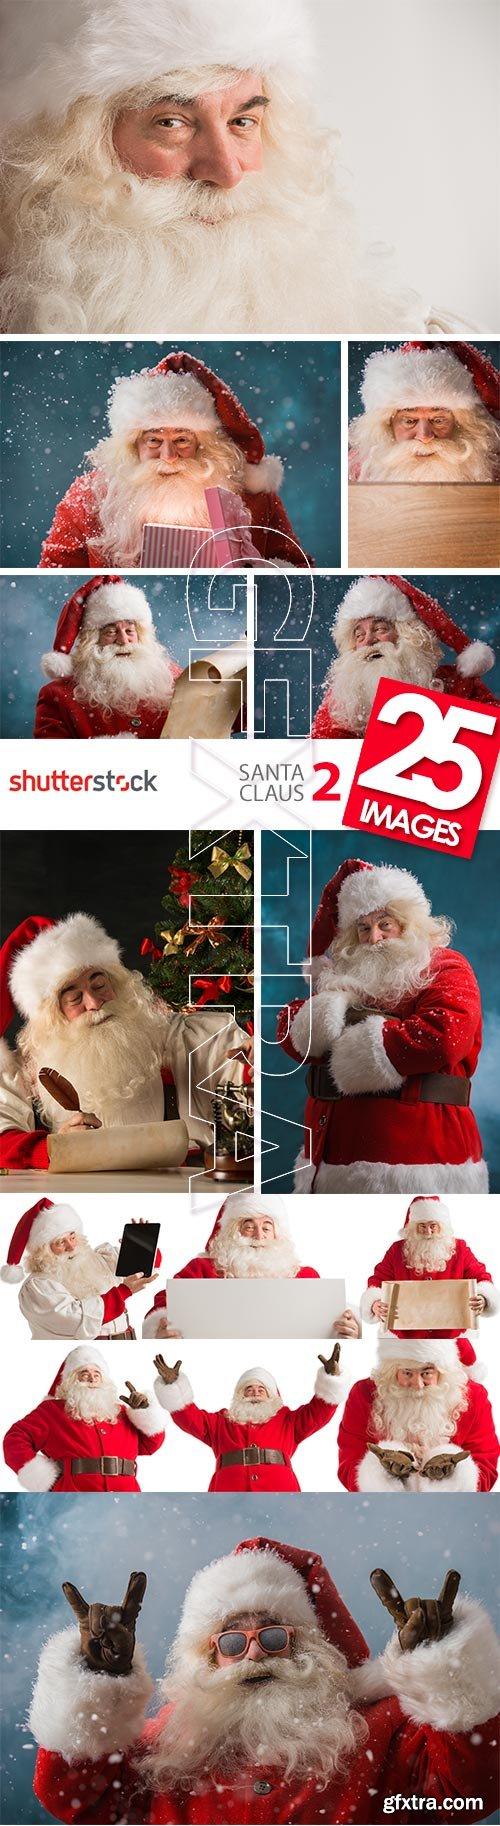 Santa Claus II, 25xJPGs